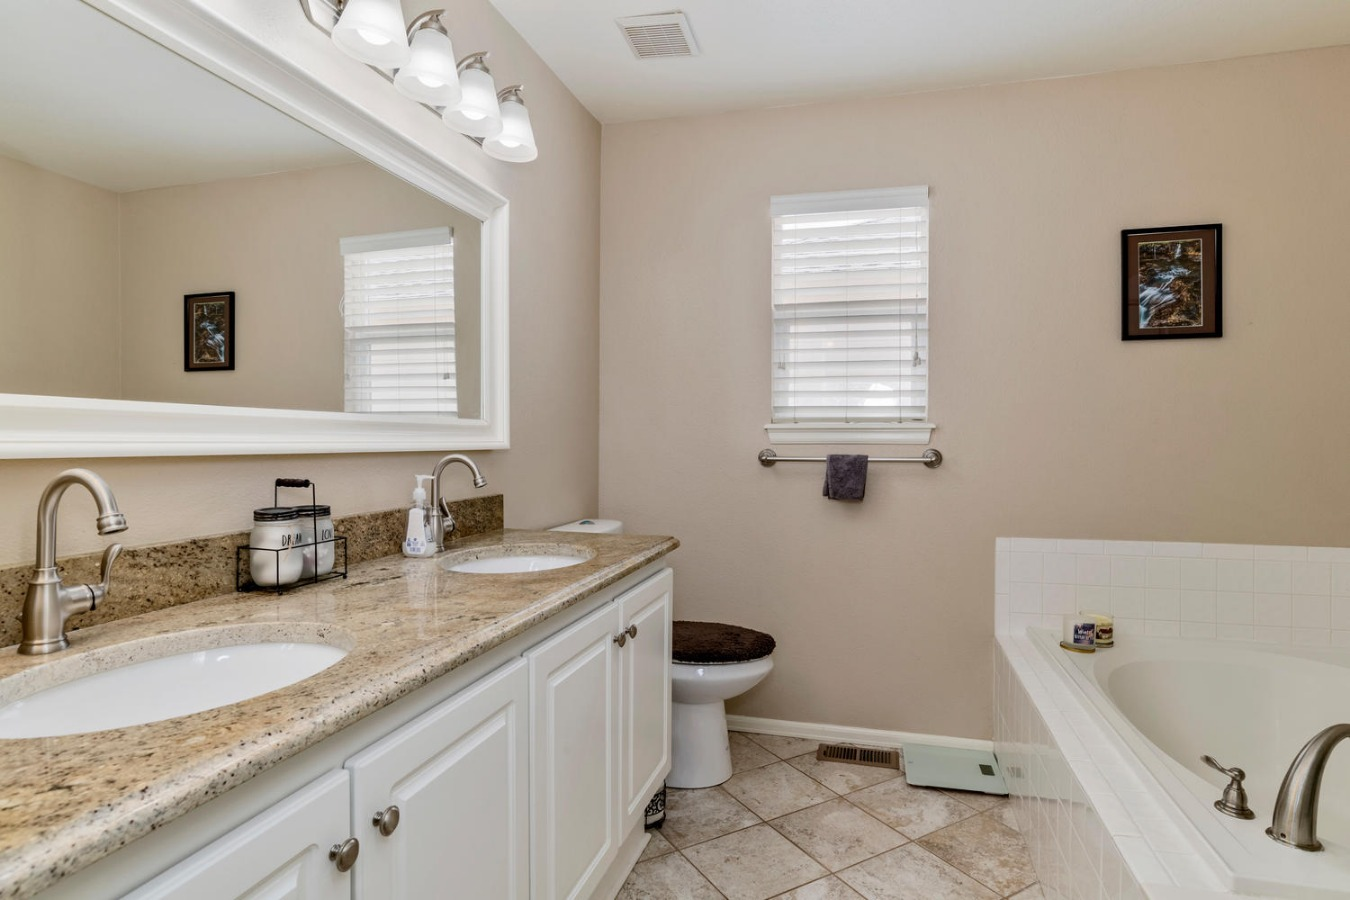 Tile & Granite in Large Master Bath